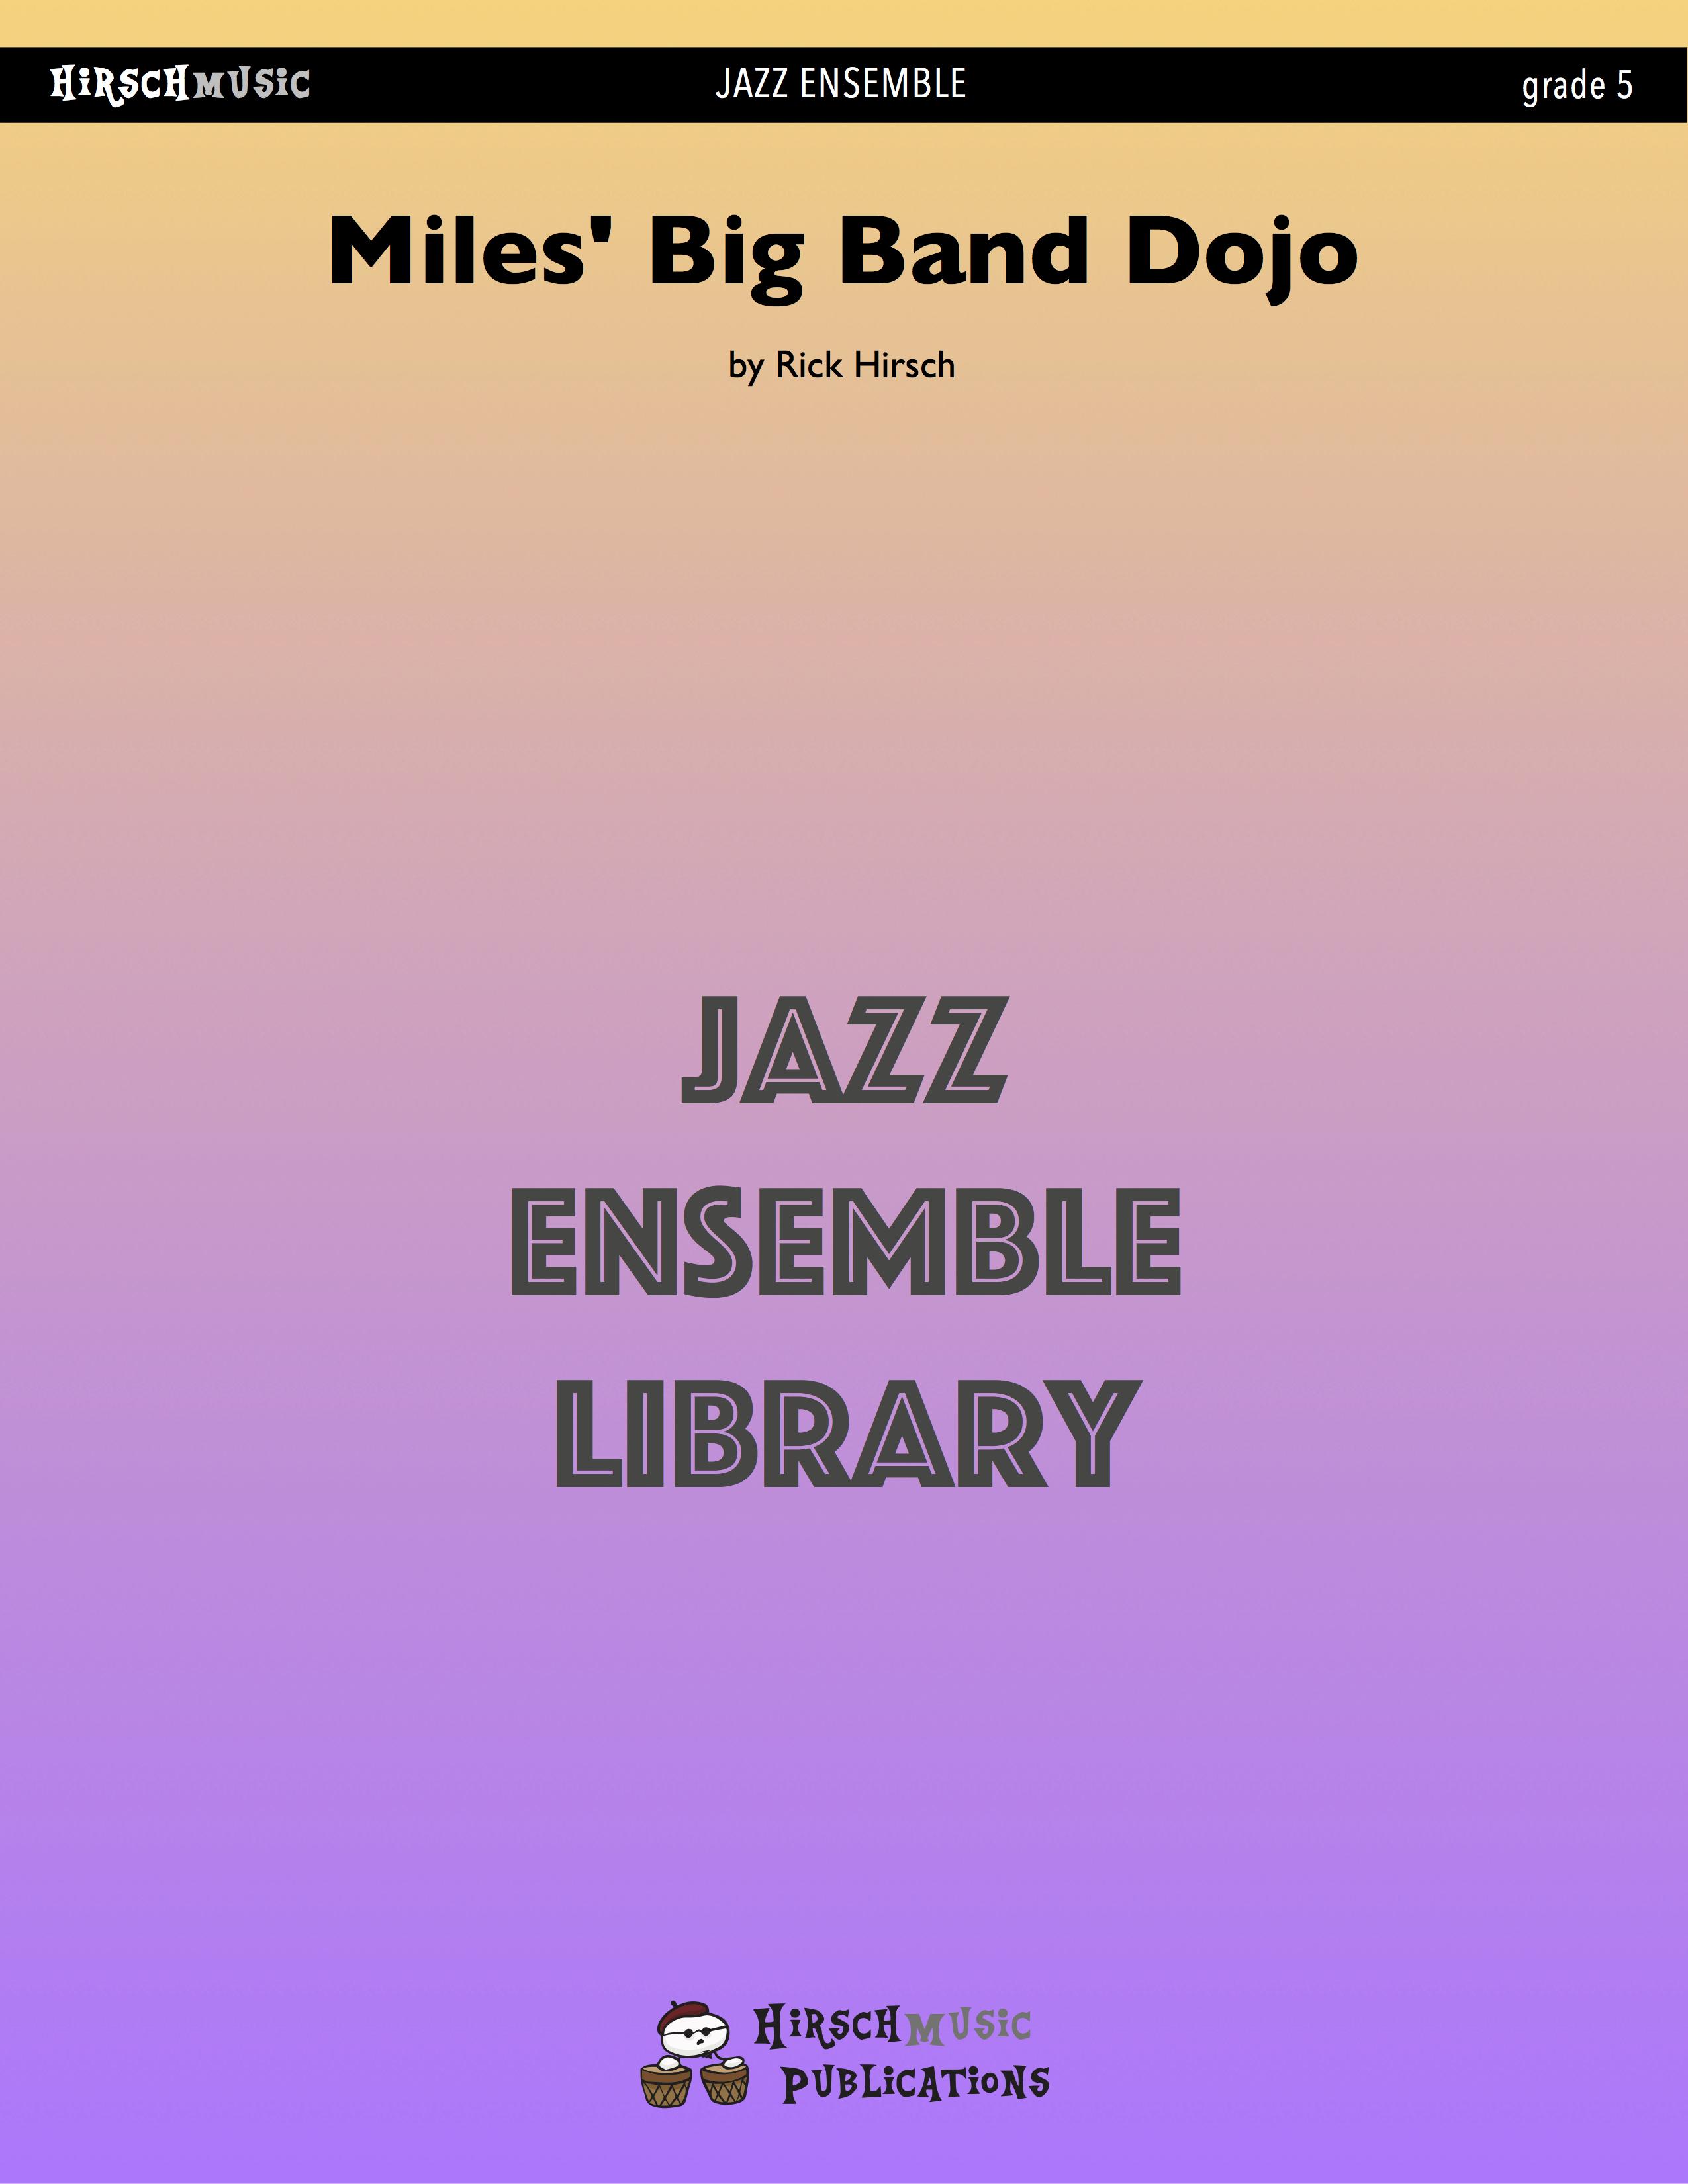 Miles' Big Band Dojo (Jazz Ensemble - Score and Parts)